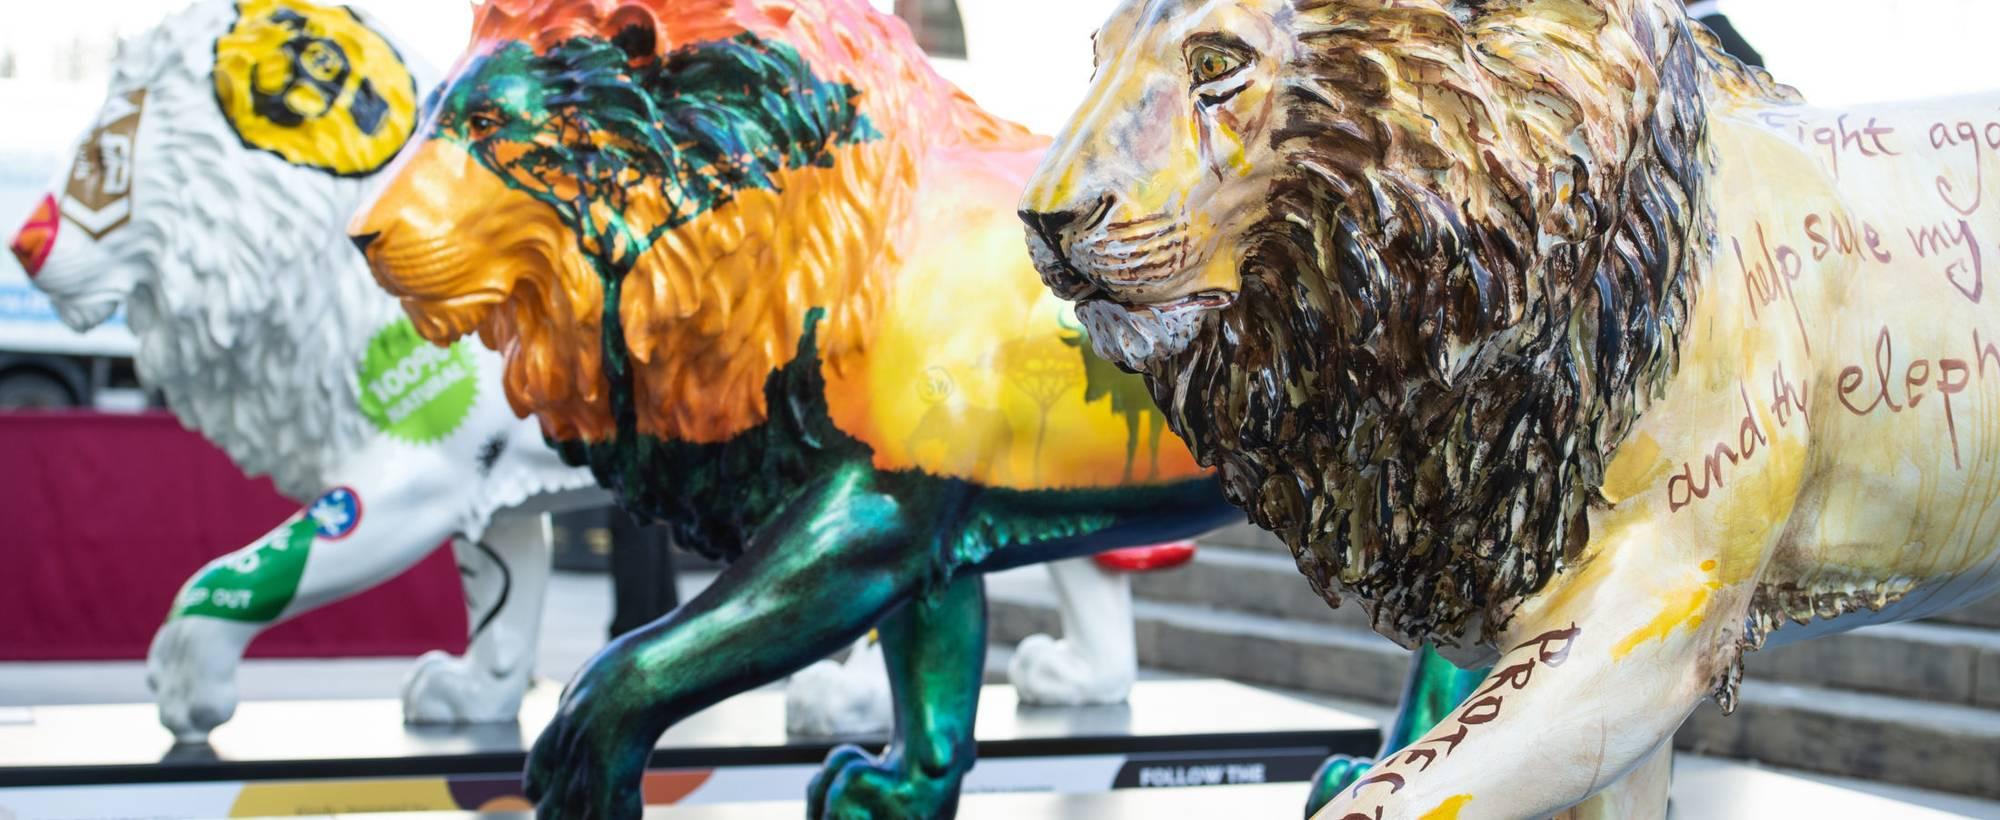 Tusk Lion Trail 2 Jeff Spicer Getty